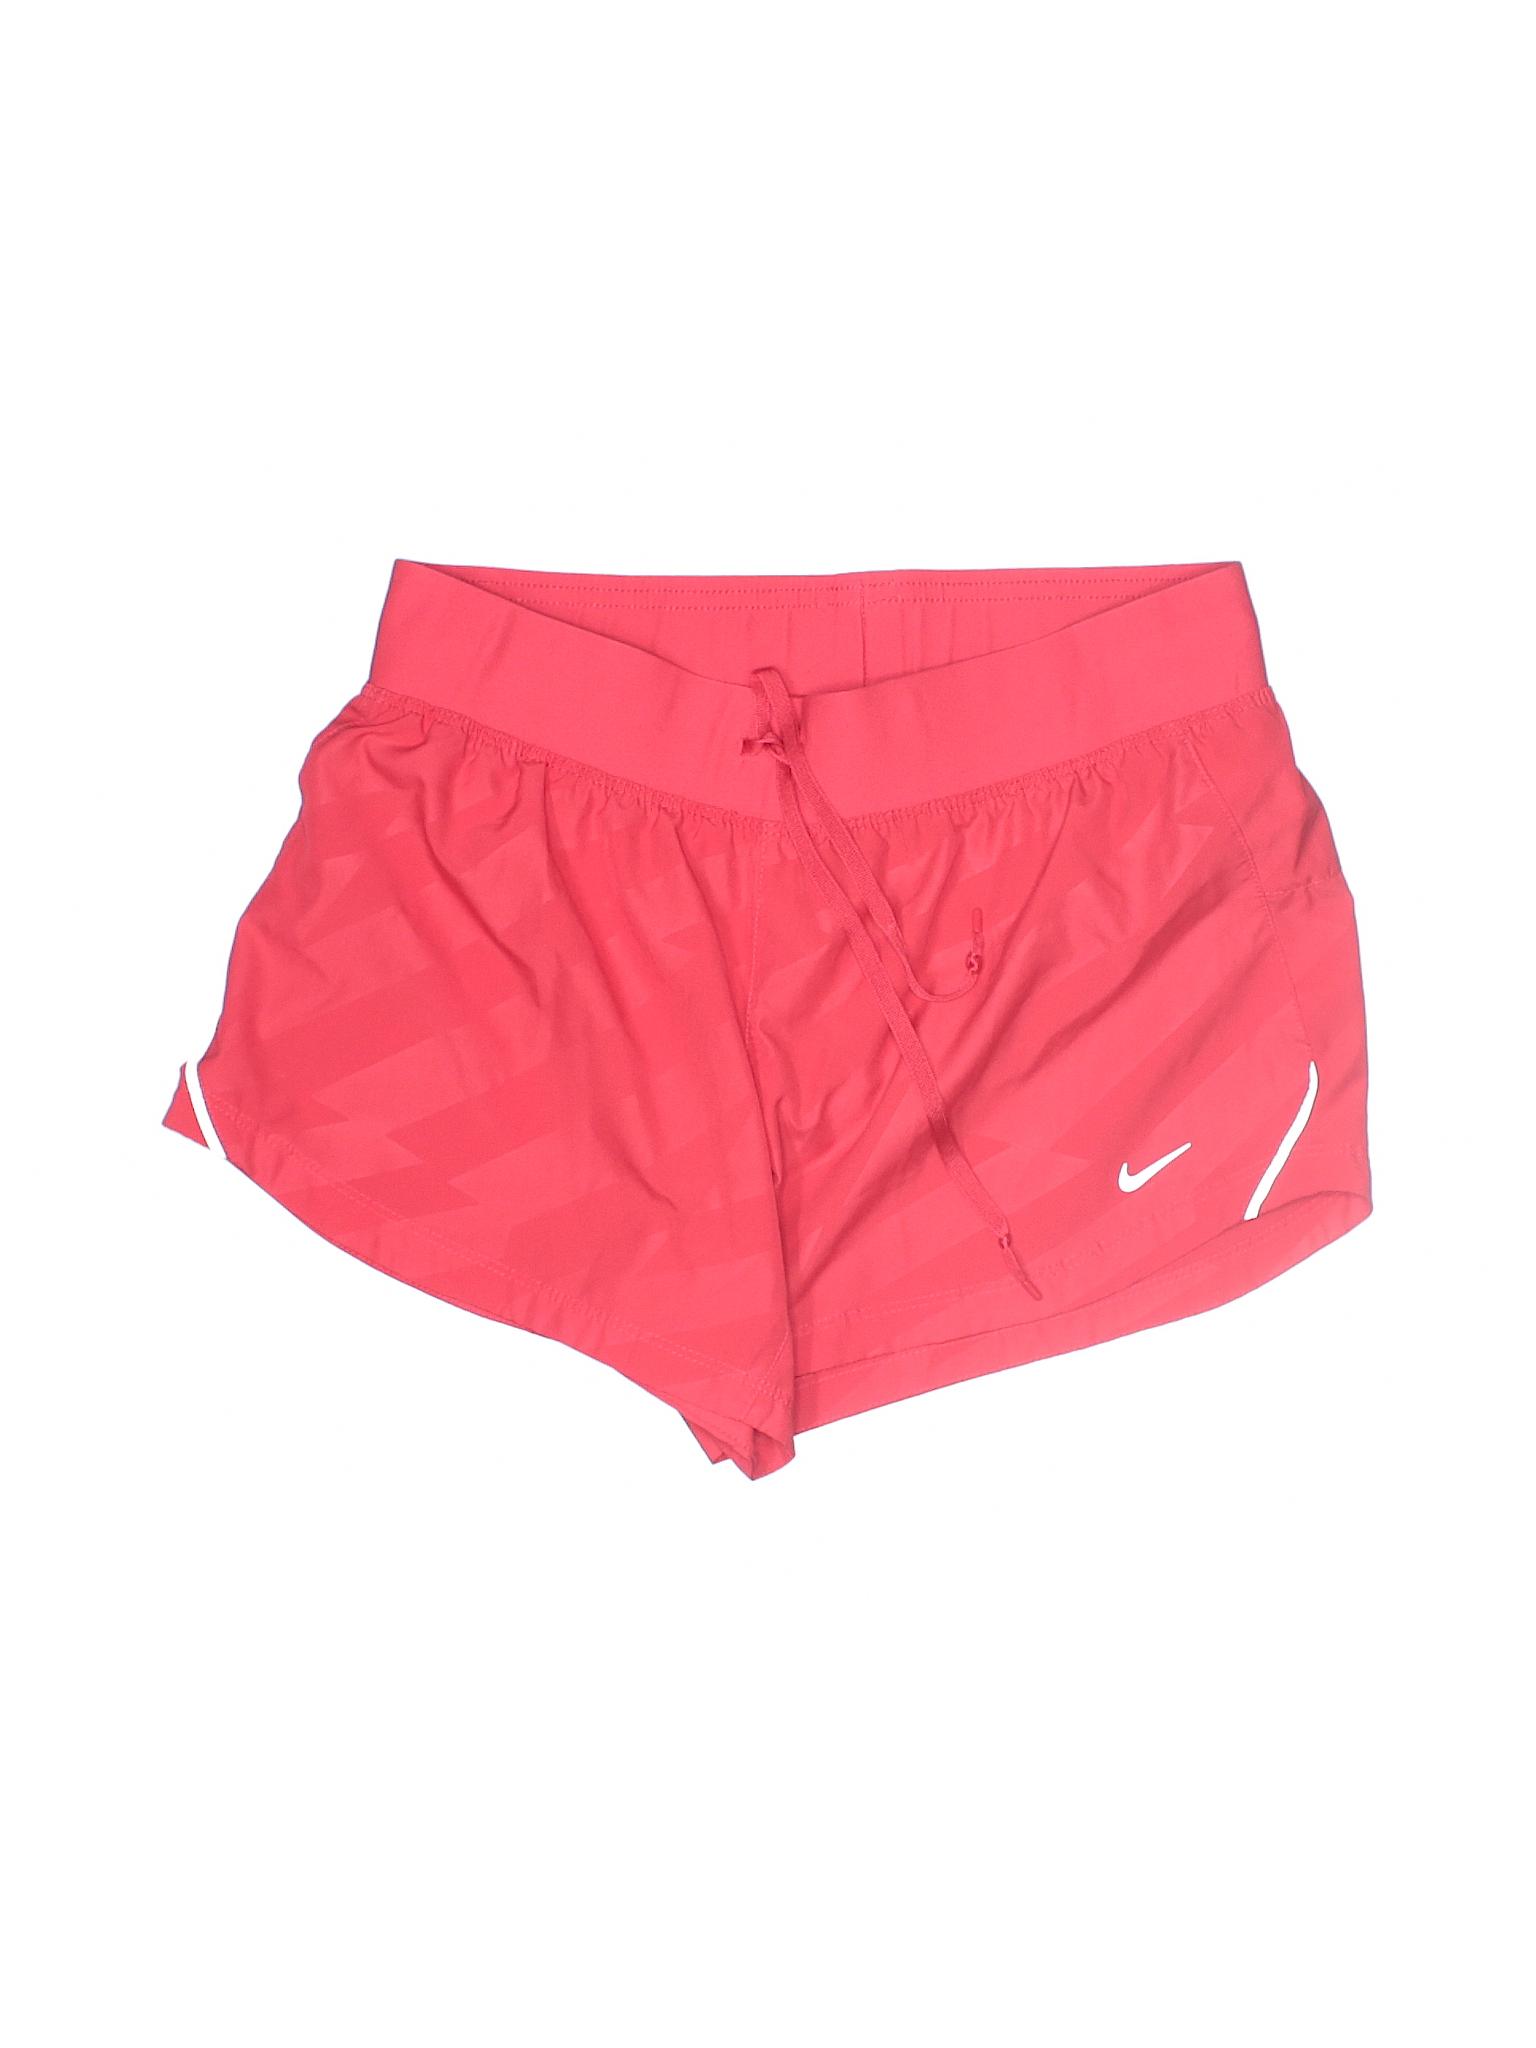 Nike Shorts Athletic winter Athletic Leisure Athletic winter Nike winter Nike Leisure Shorts Leisure 7nUvOxB